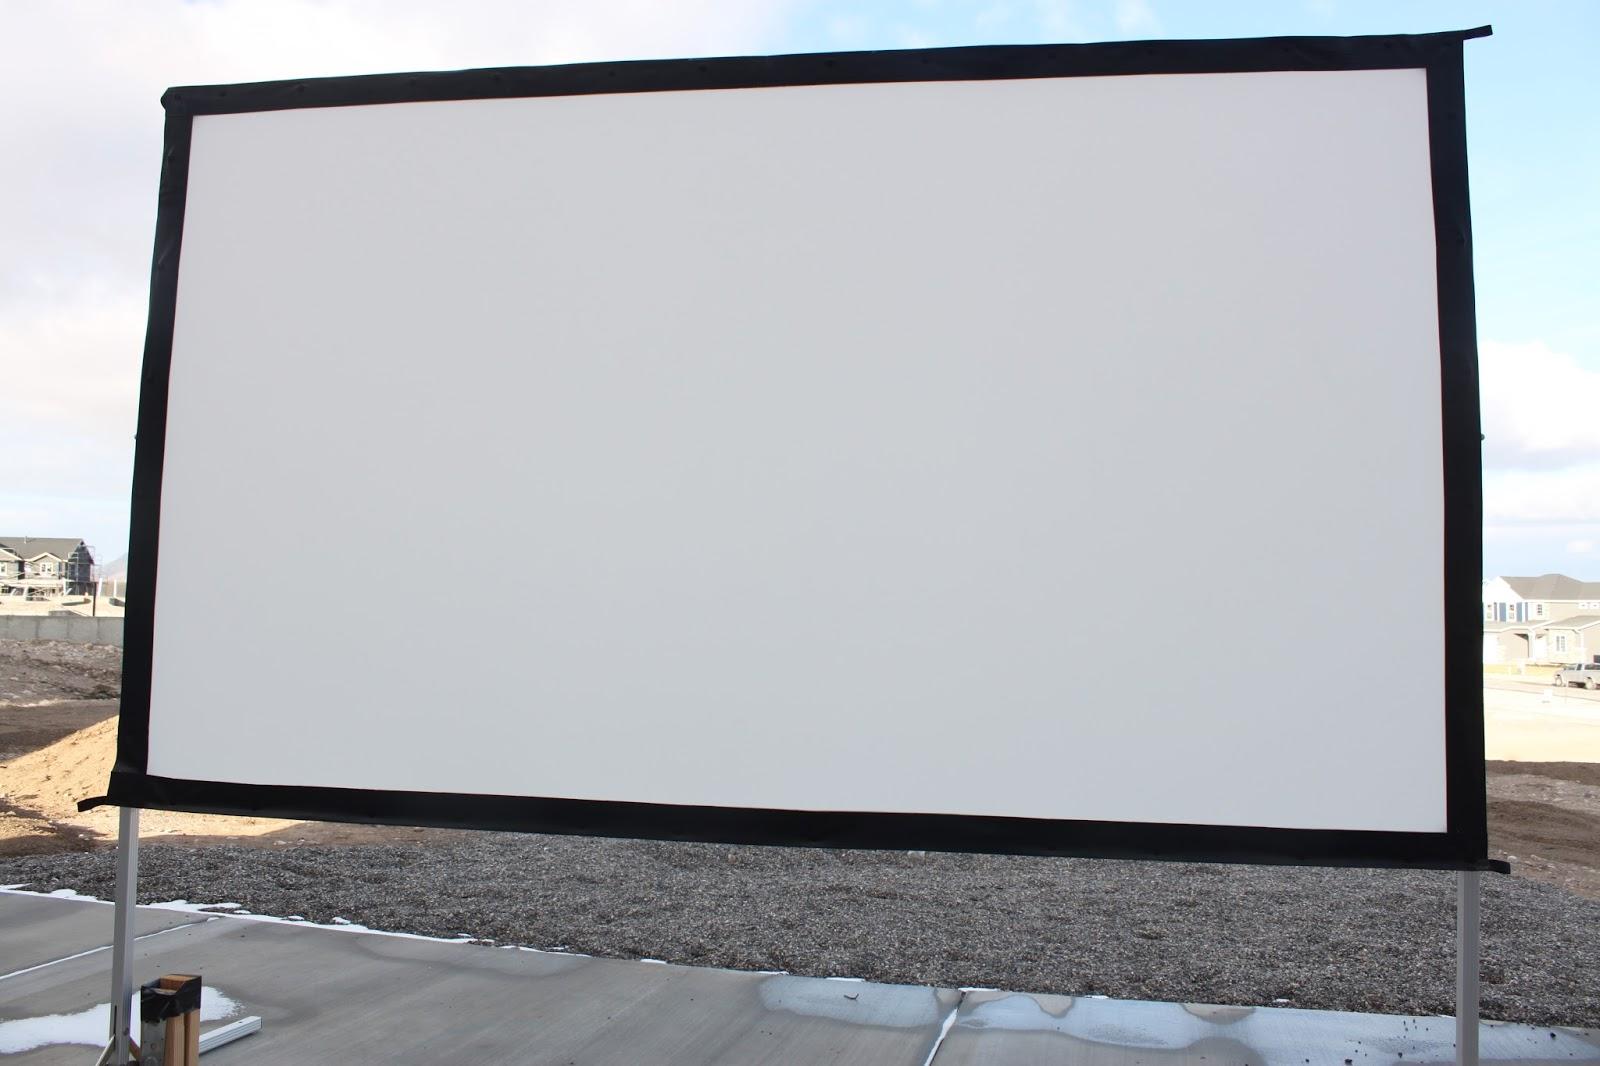 Stereowise Plus  Elite Screens Yard Master 2 Dual 120